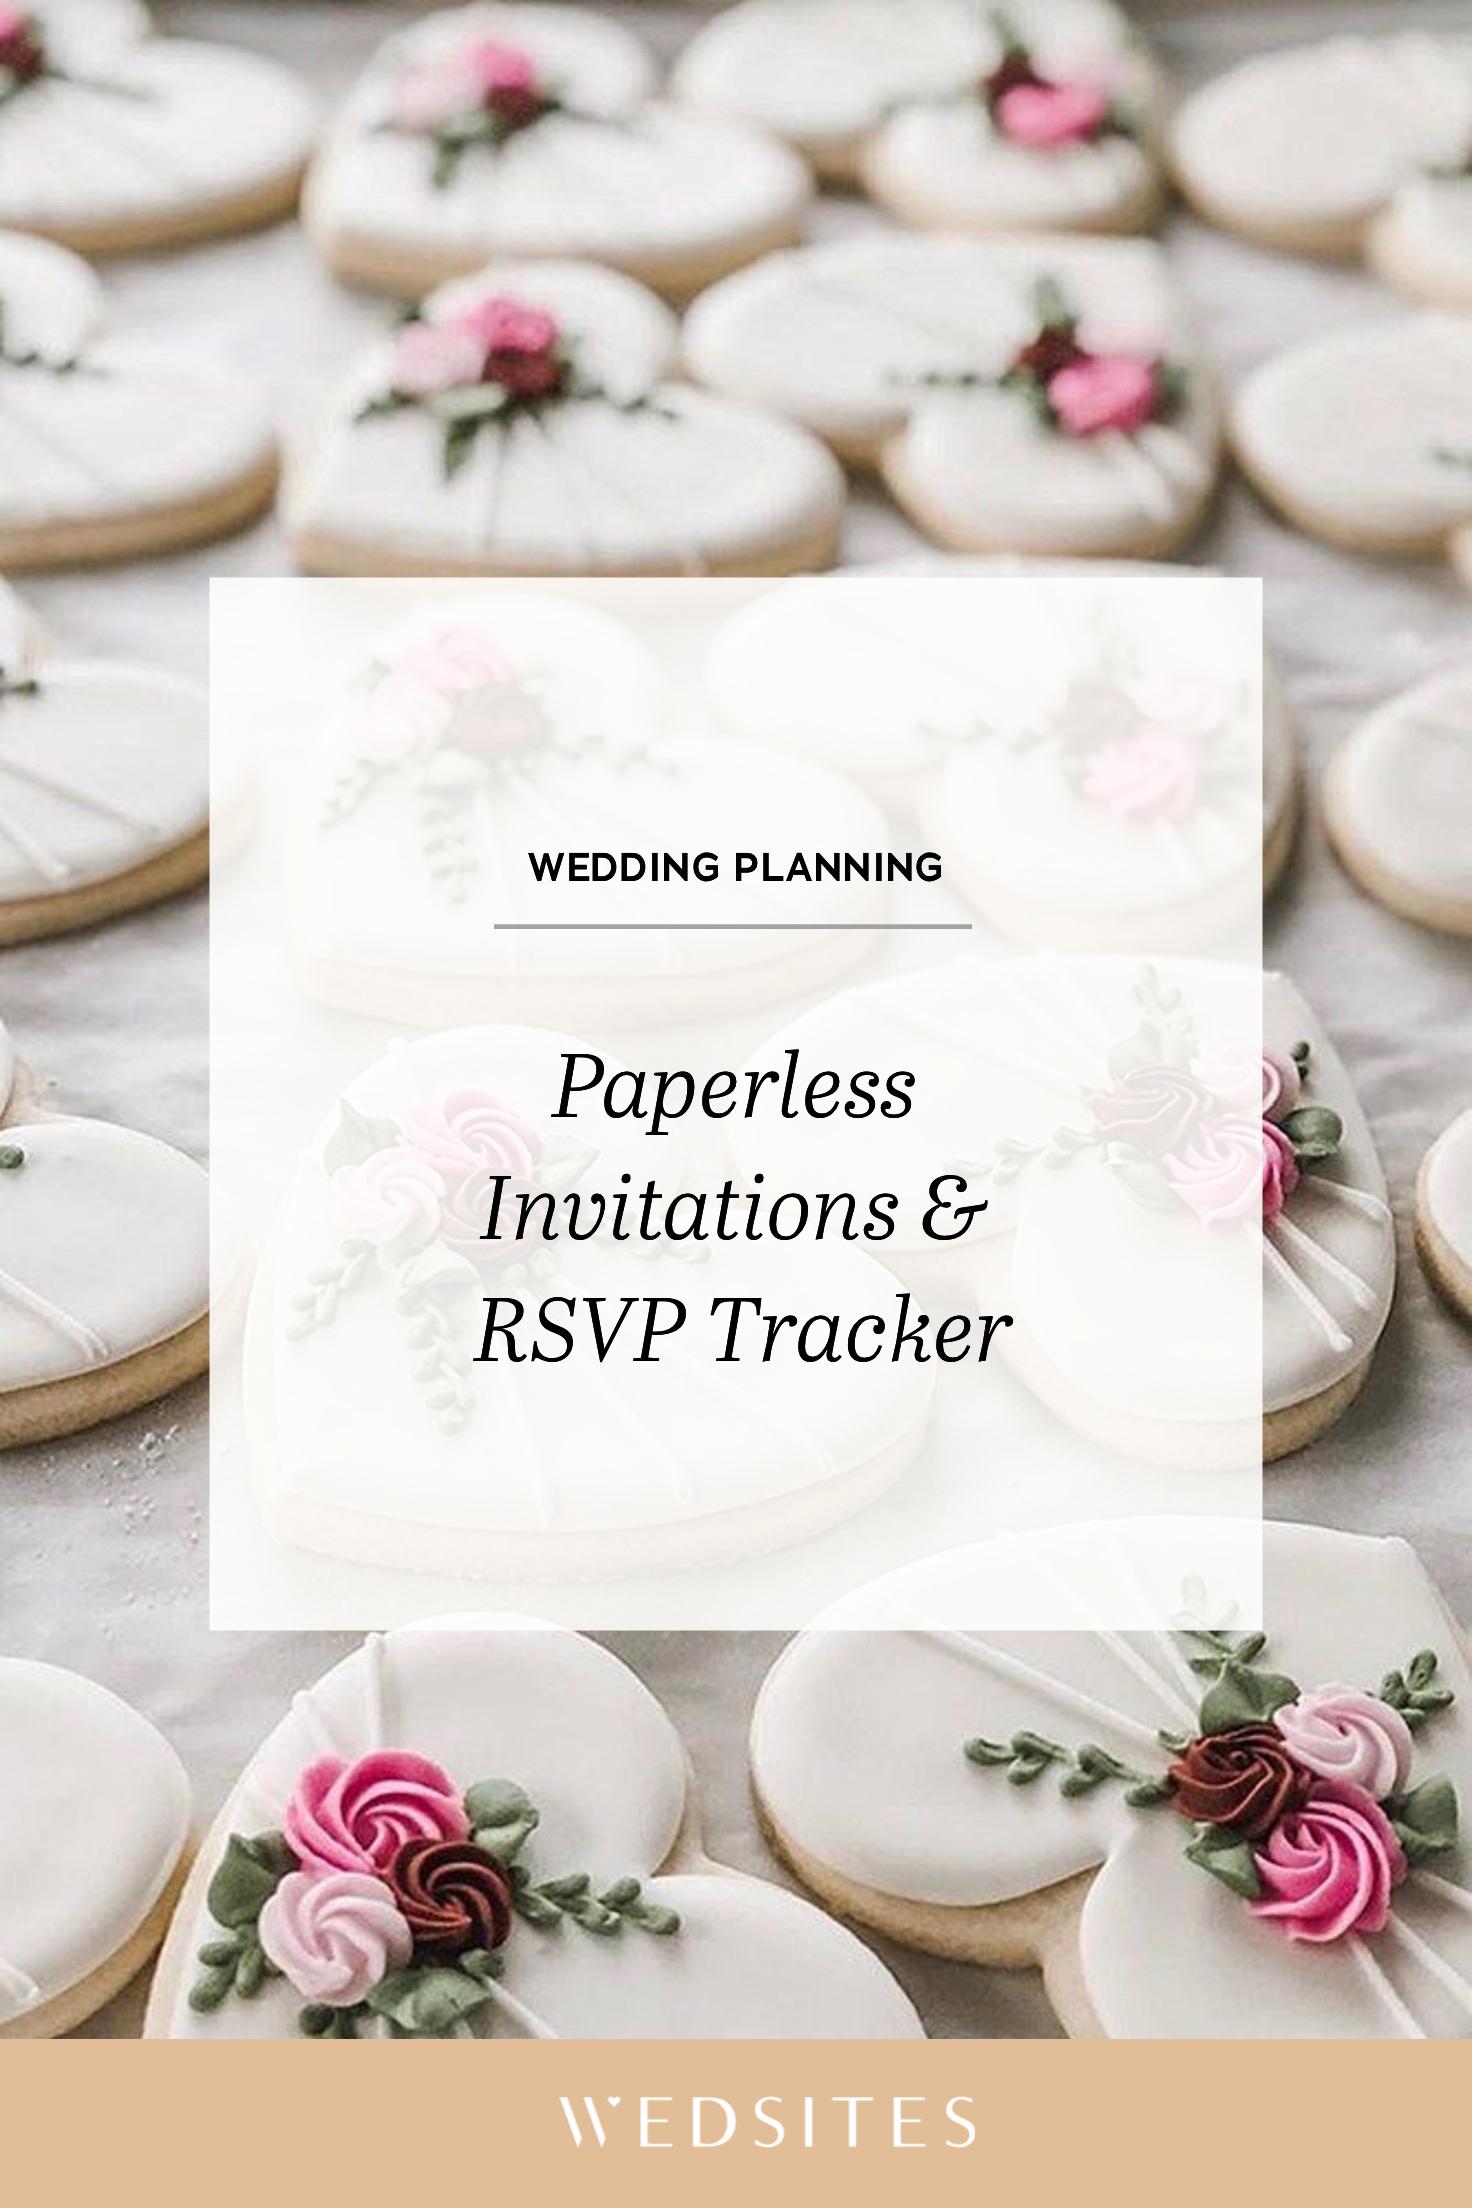 Paperless Invitations & RSVP Tracker in 2020 Wedding